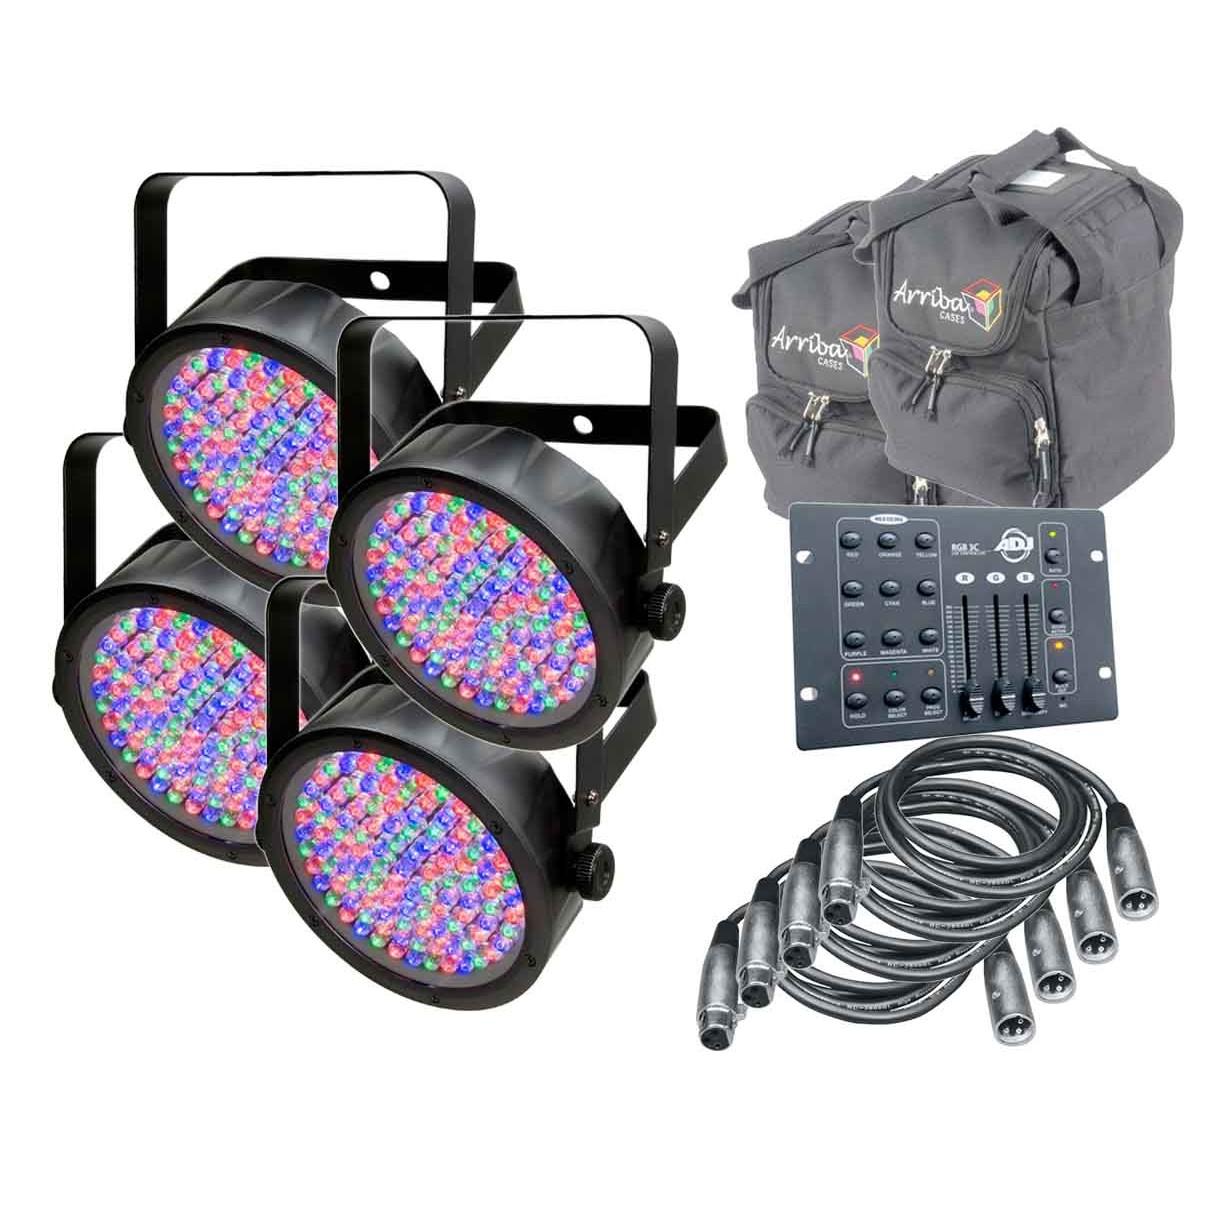 4x chauvet dj slimpar 56 rgb3cir arriba cases ac115 4 dmx cables. Black Bedroom Furniture Sets. Home Design Ideas